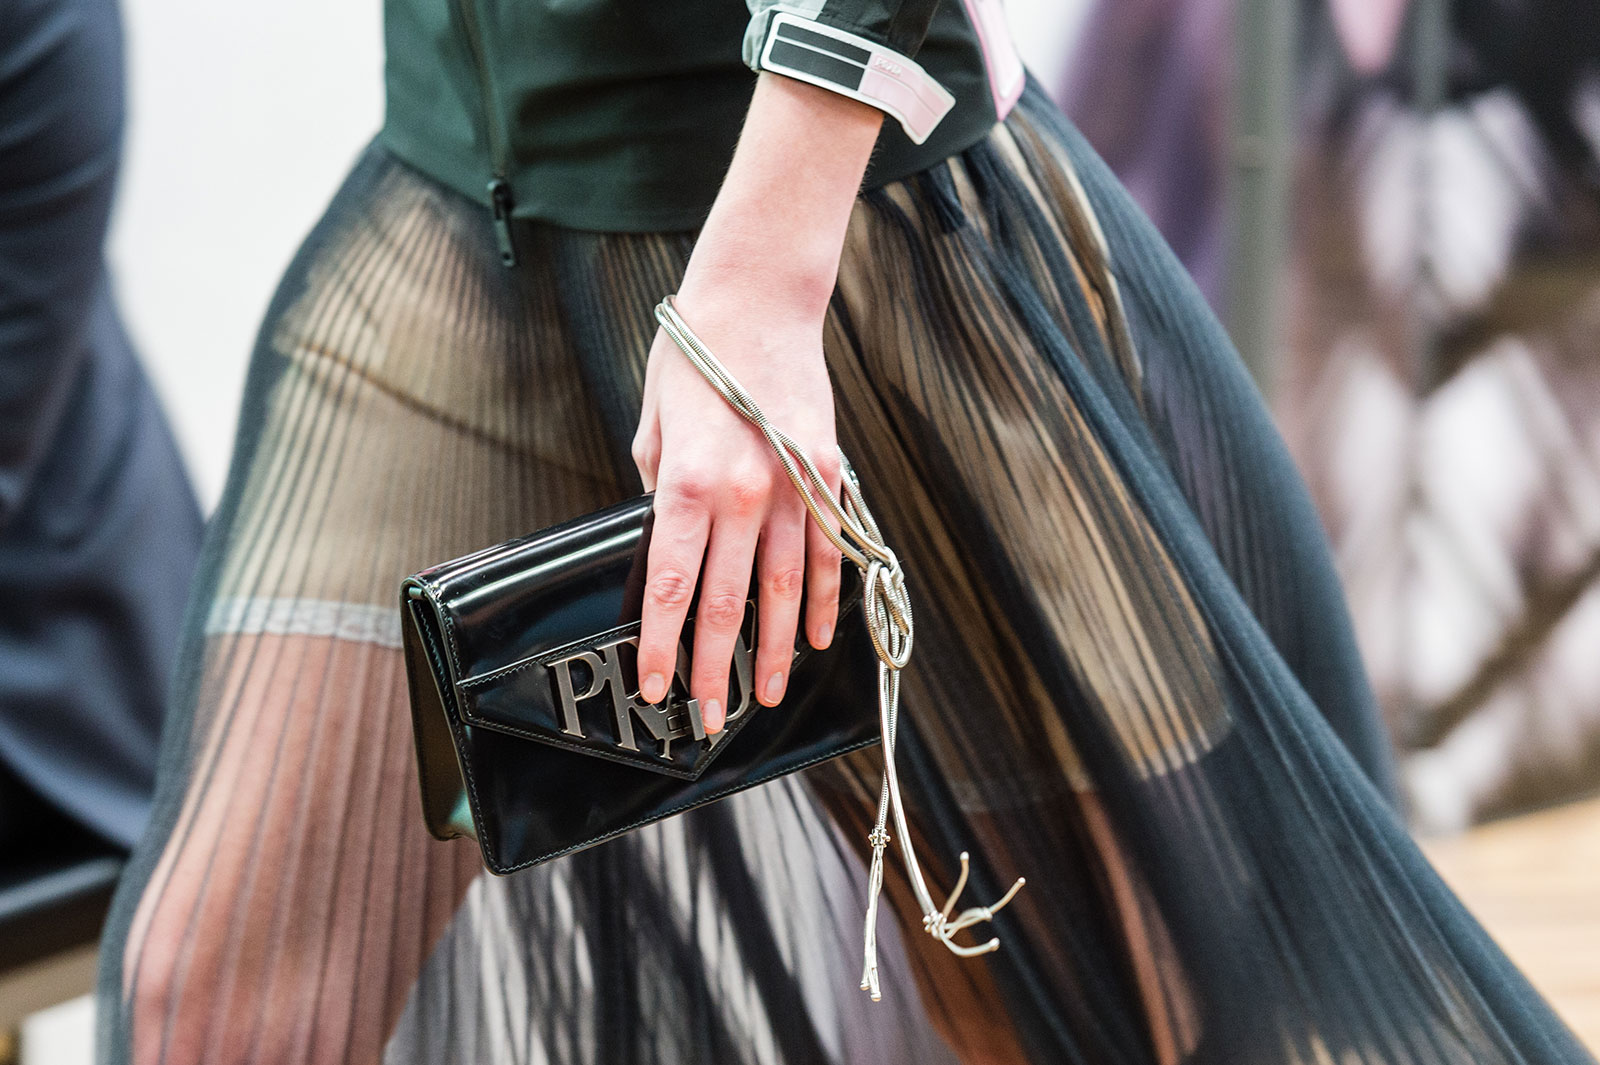 d6e67e4c8220 Prada Resort 2018 Runway Bag Collection | Spotted Fashion